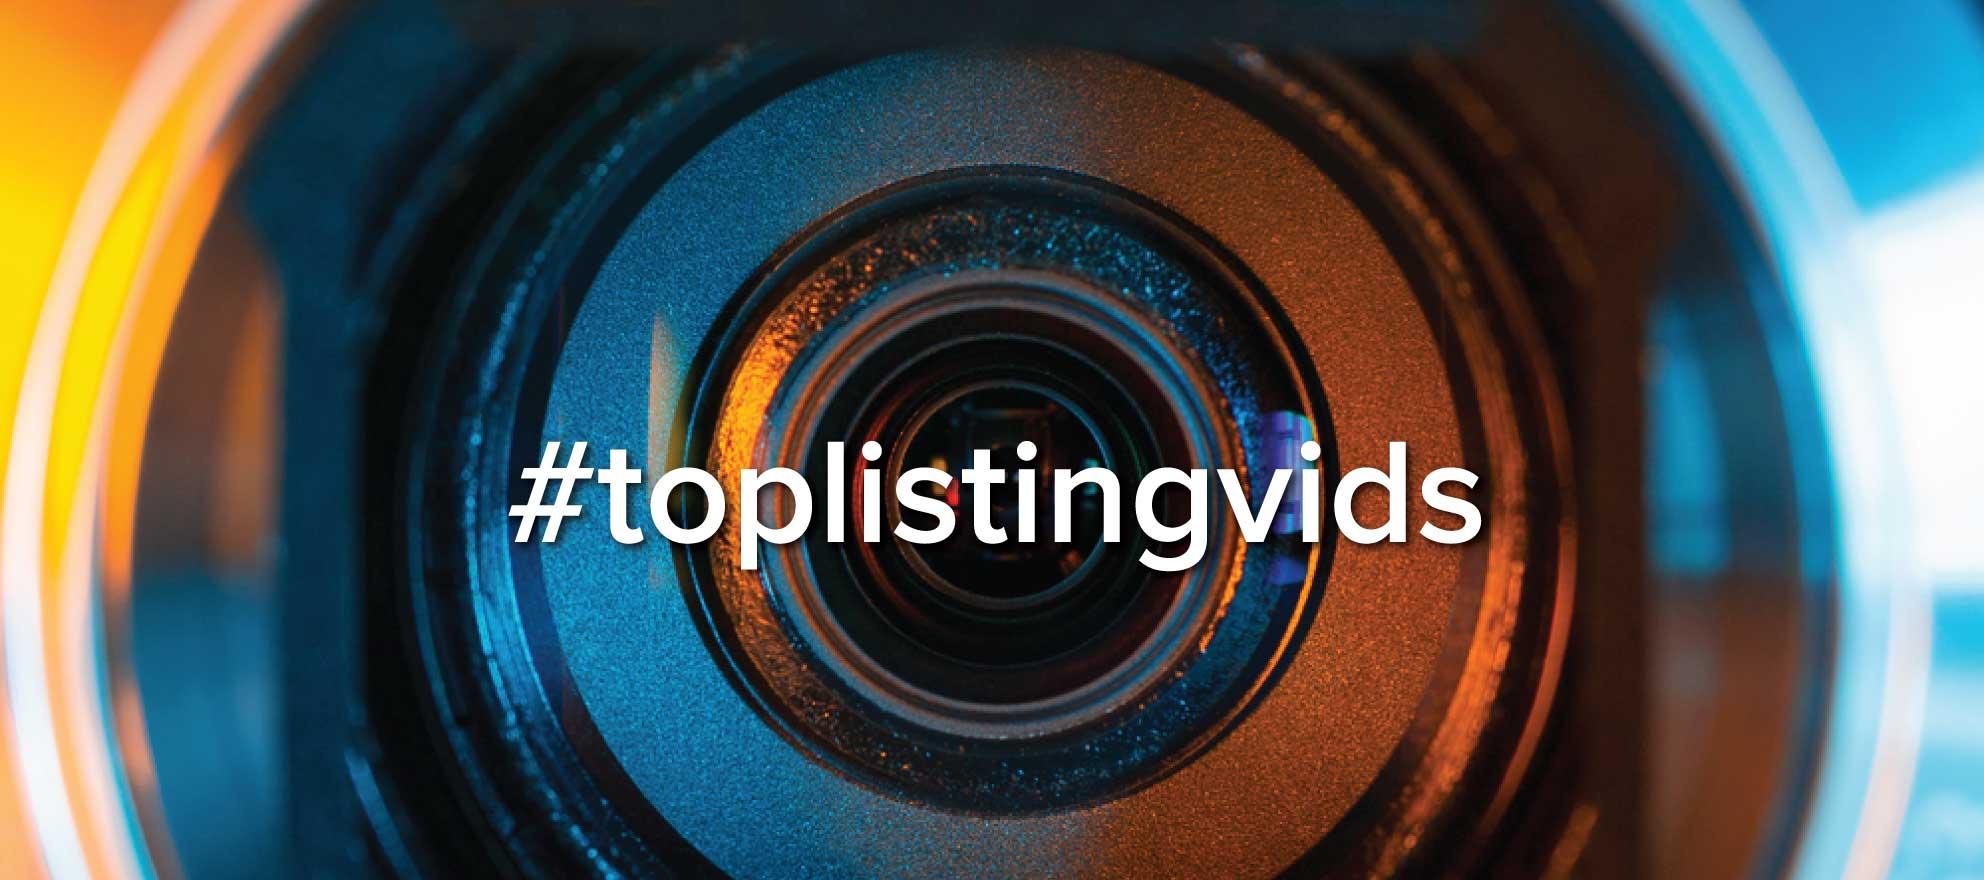 #toplistingvids contest, drone edition